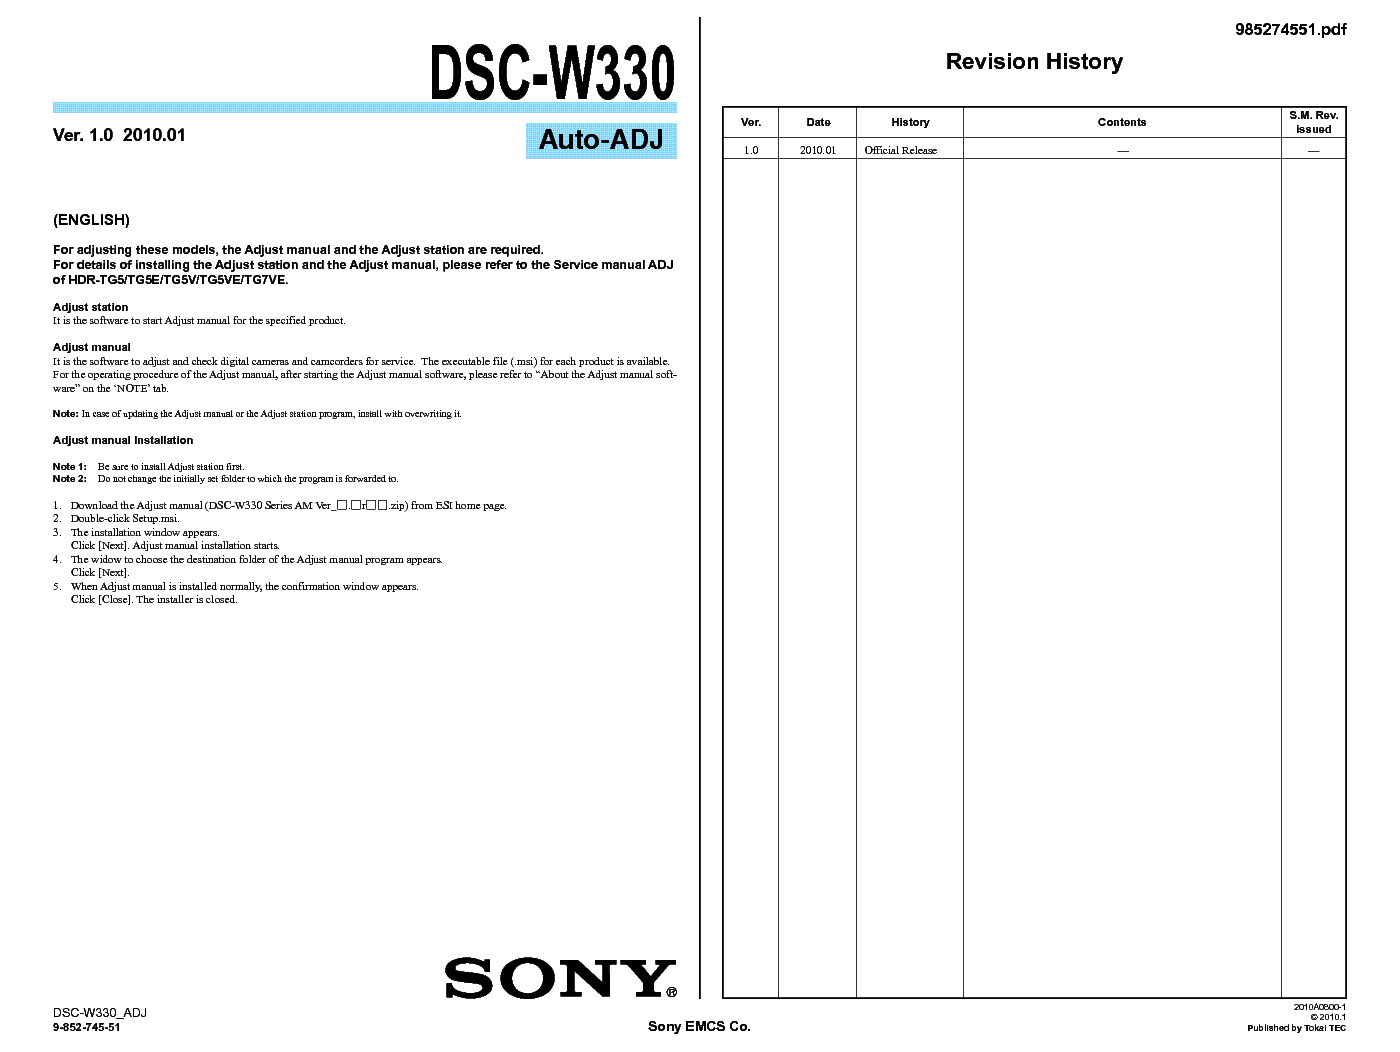 Sony cyber-shot-dsc-w330-141-mp-digital-camera-manual.